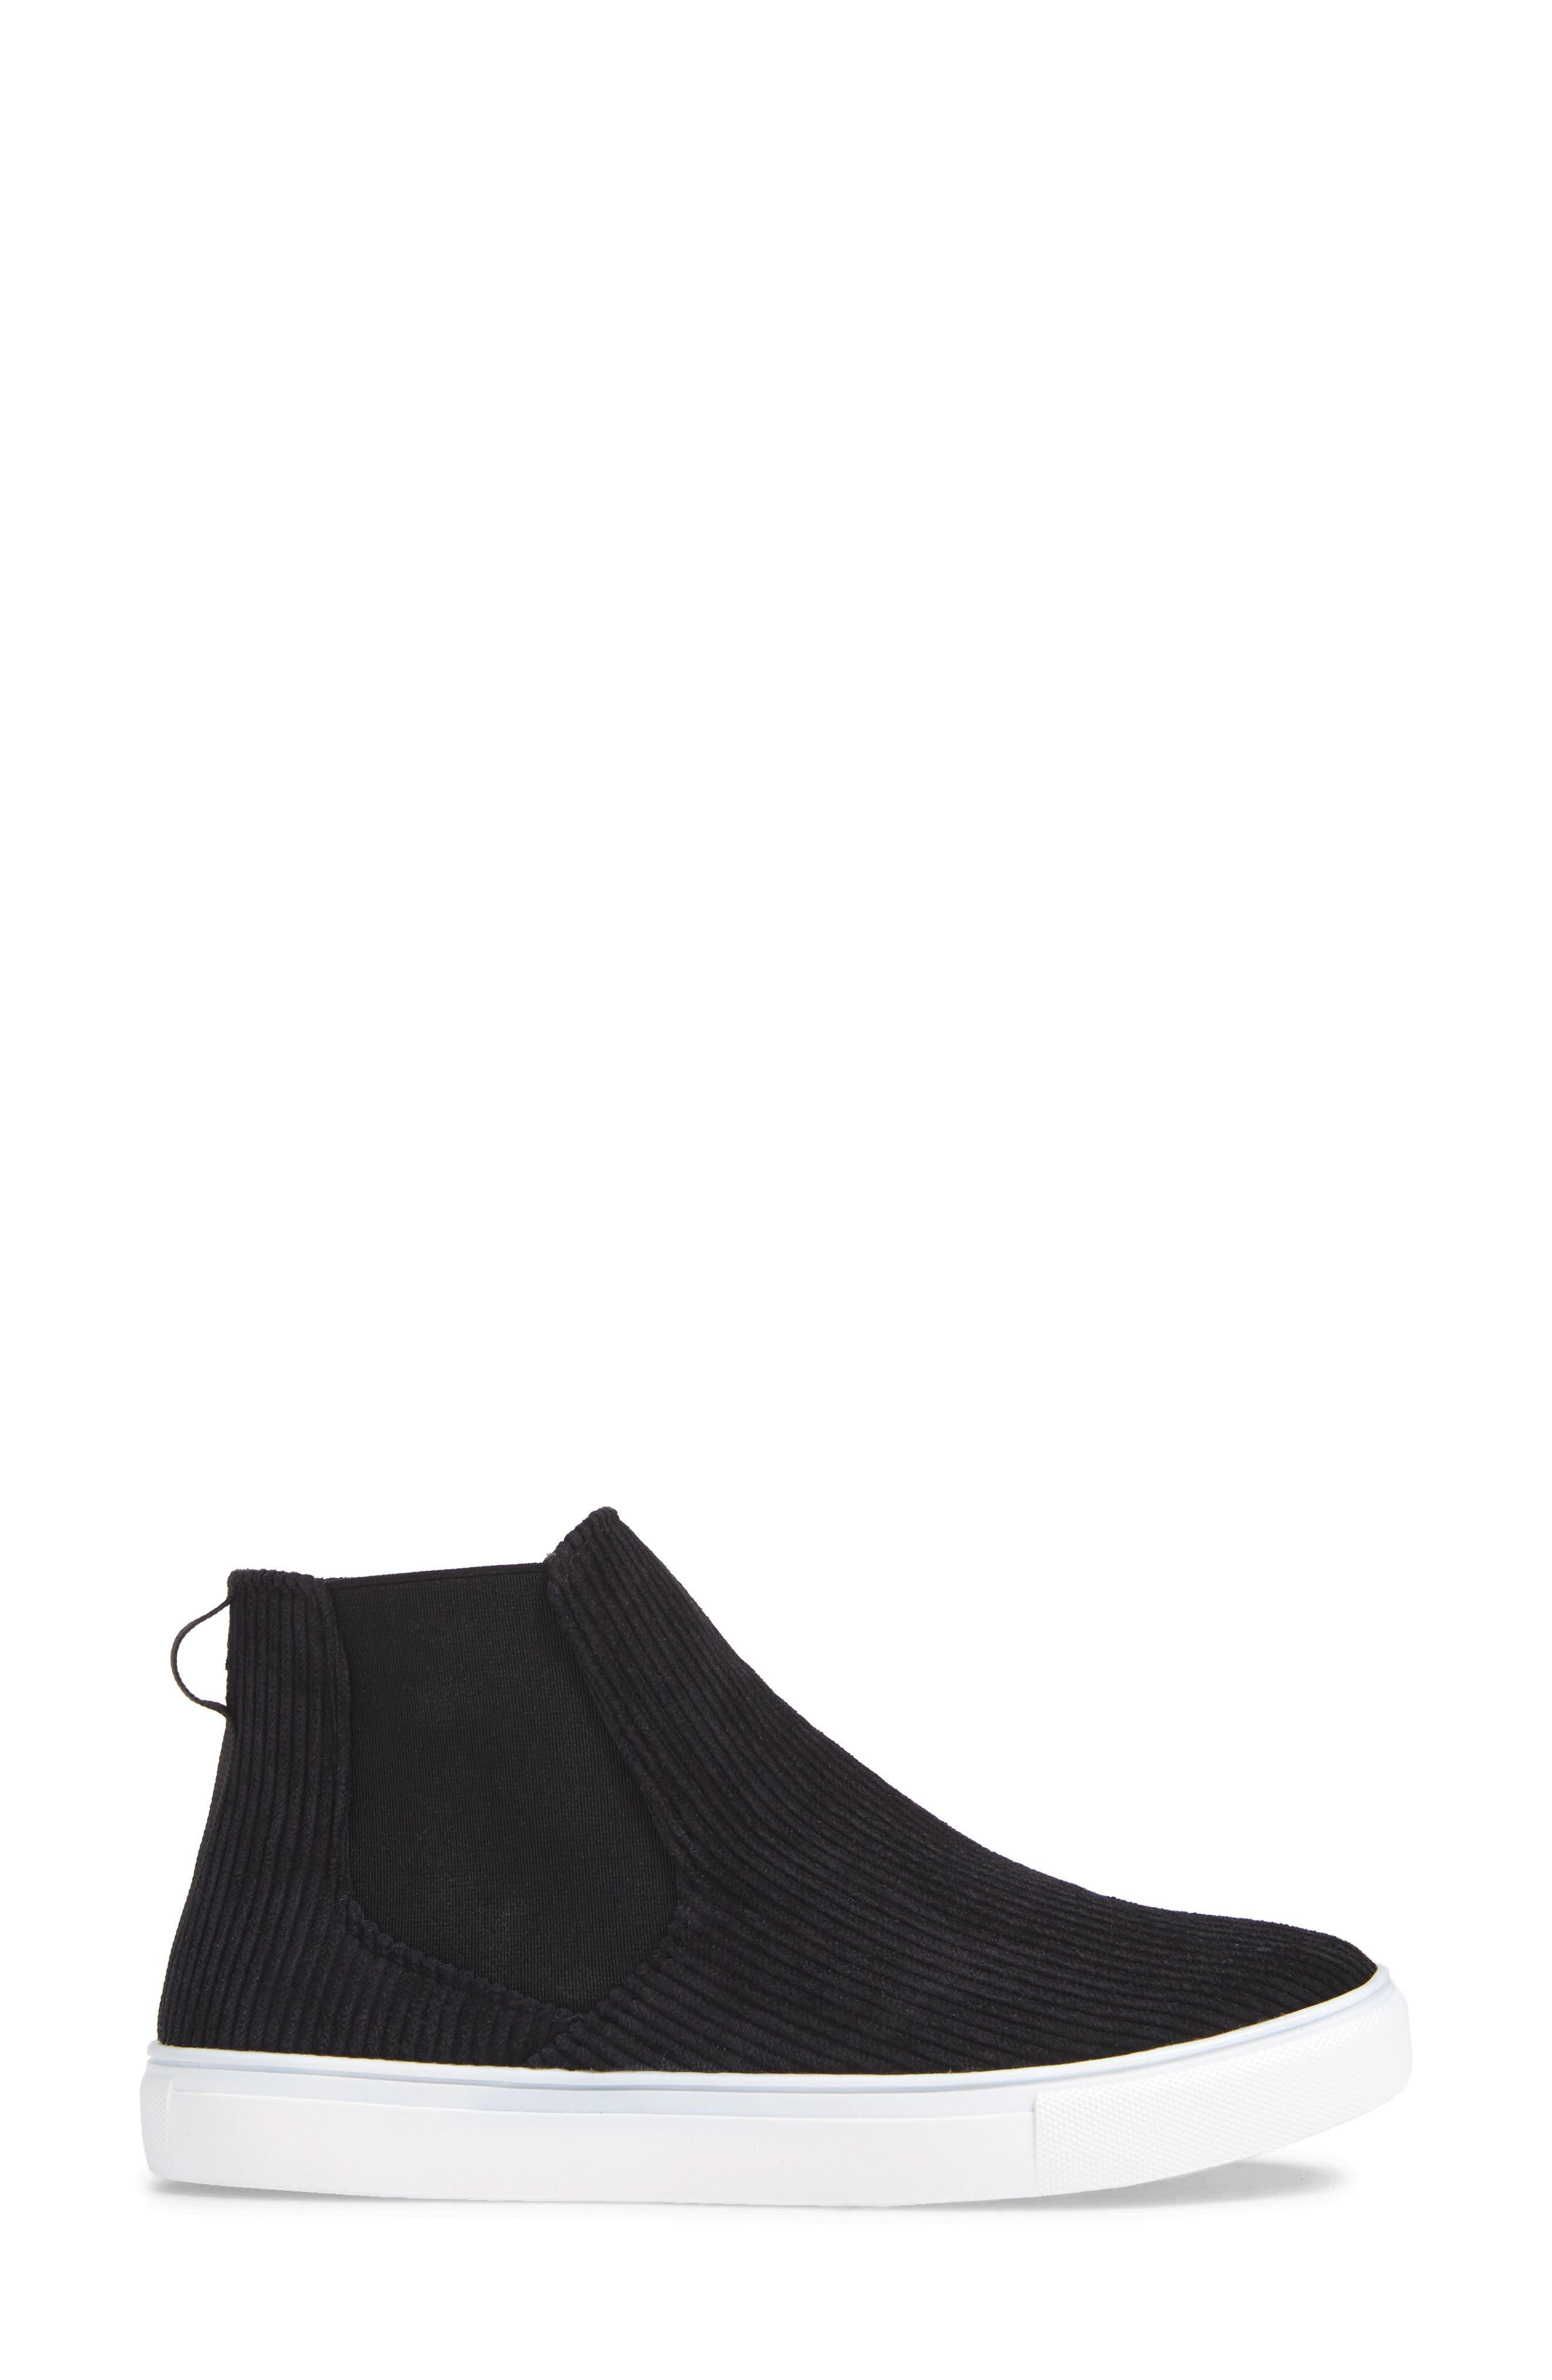 Stratford High Top Sneaker,                             Alternate thumbnail 3, color,                             BLACK FABRIC